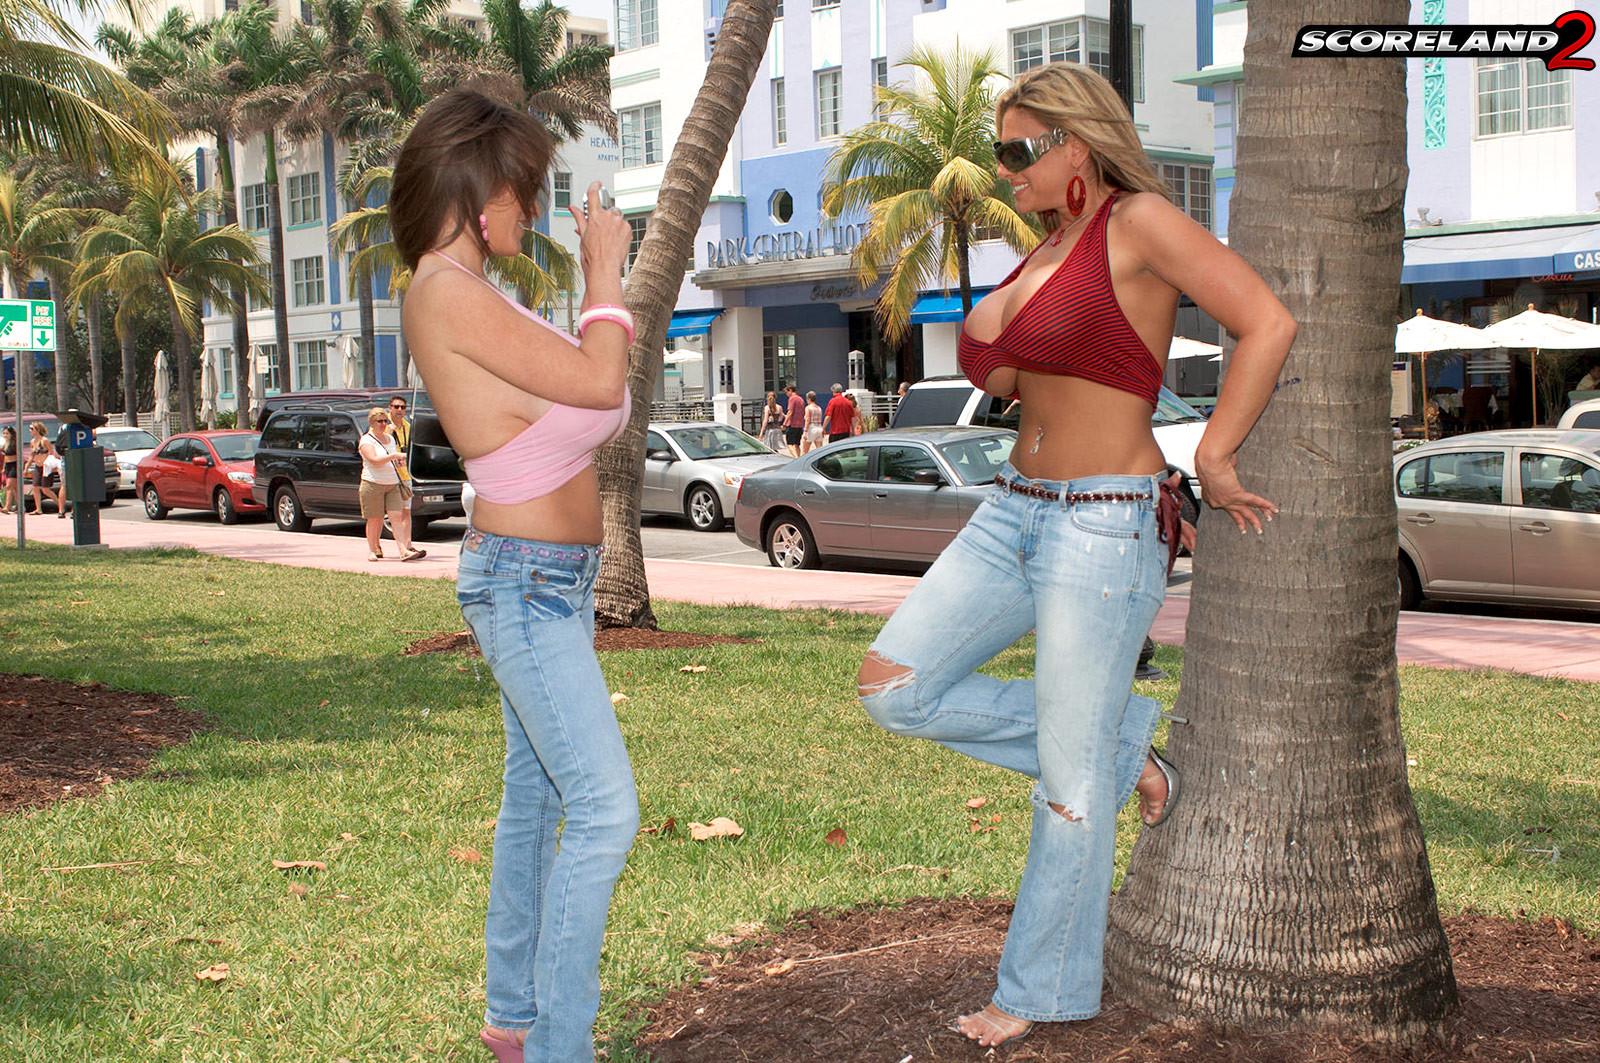 toronto erotic video escort massage